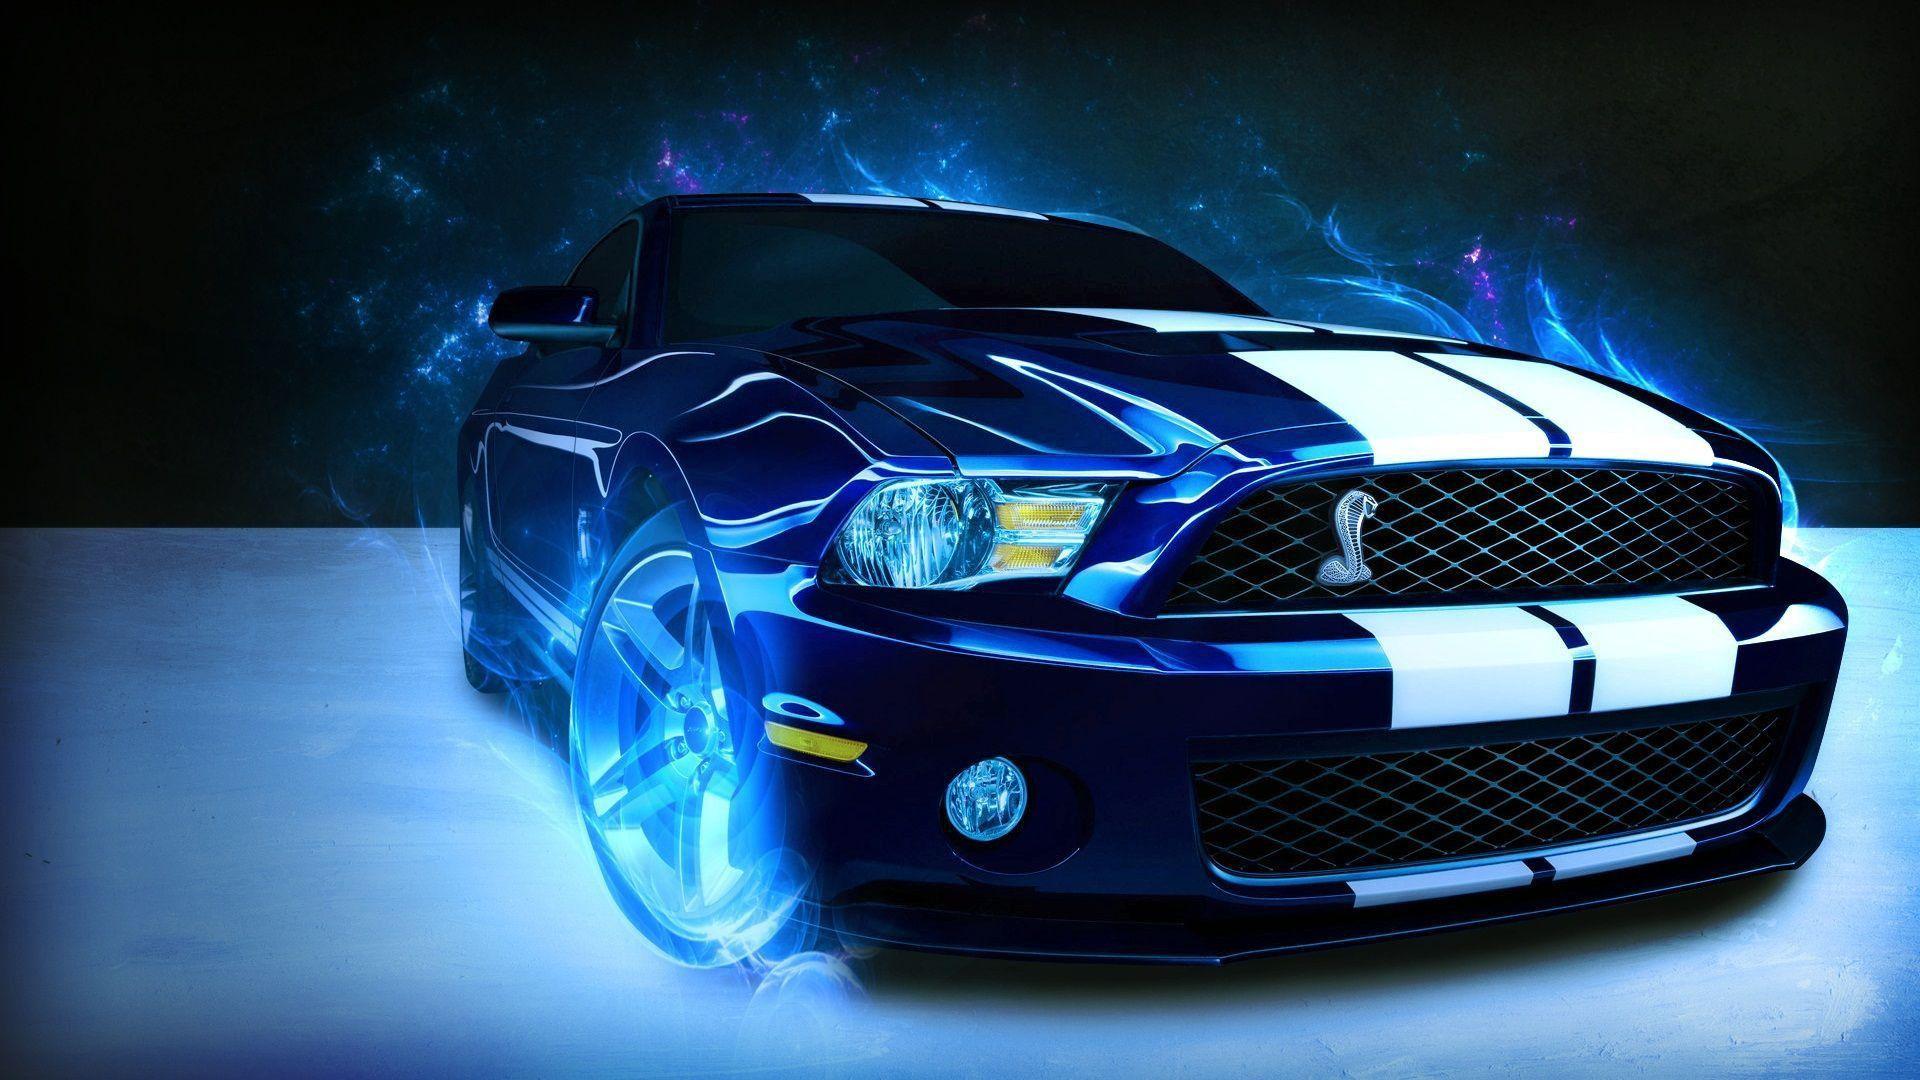 Pin by Joe Wilson on Car Mustang wallpaper, Car